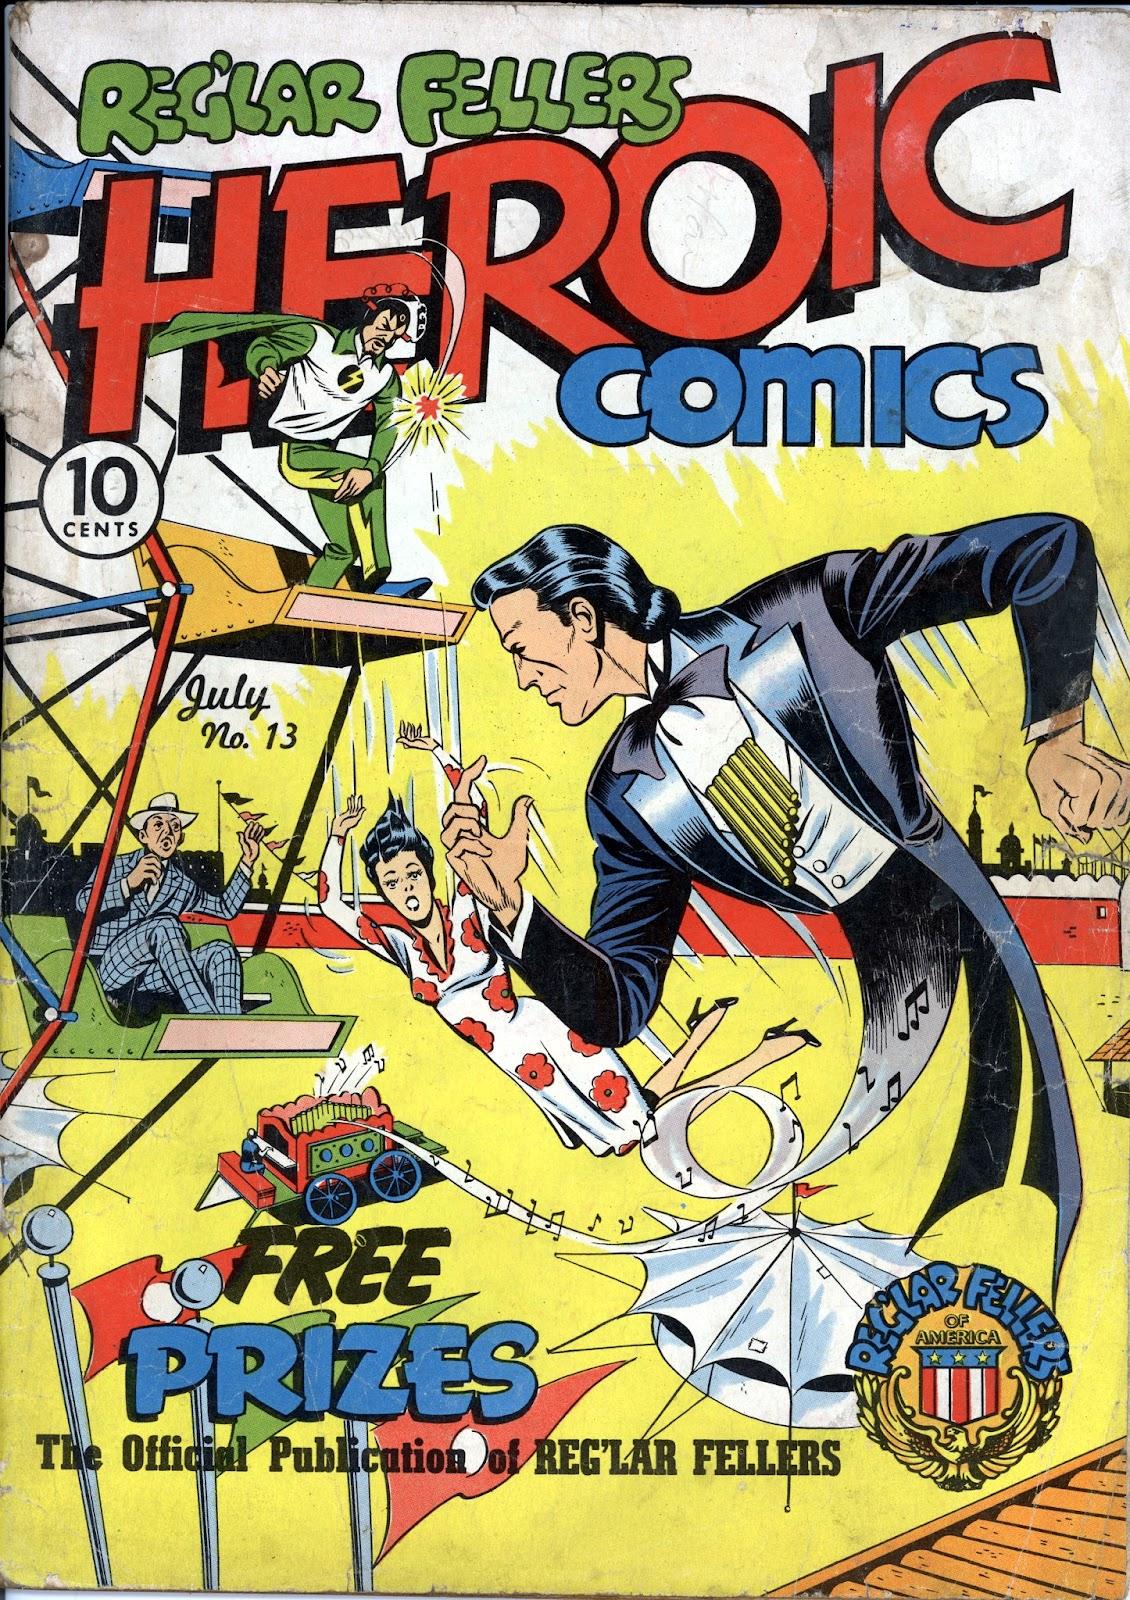 Reglar Fellers Heroic Comics issue 13 - Page 1